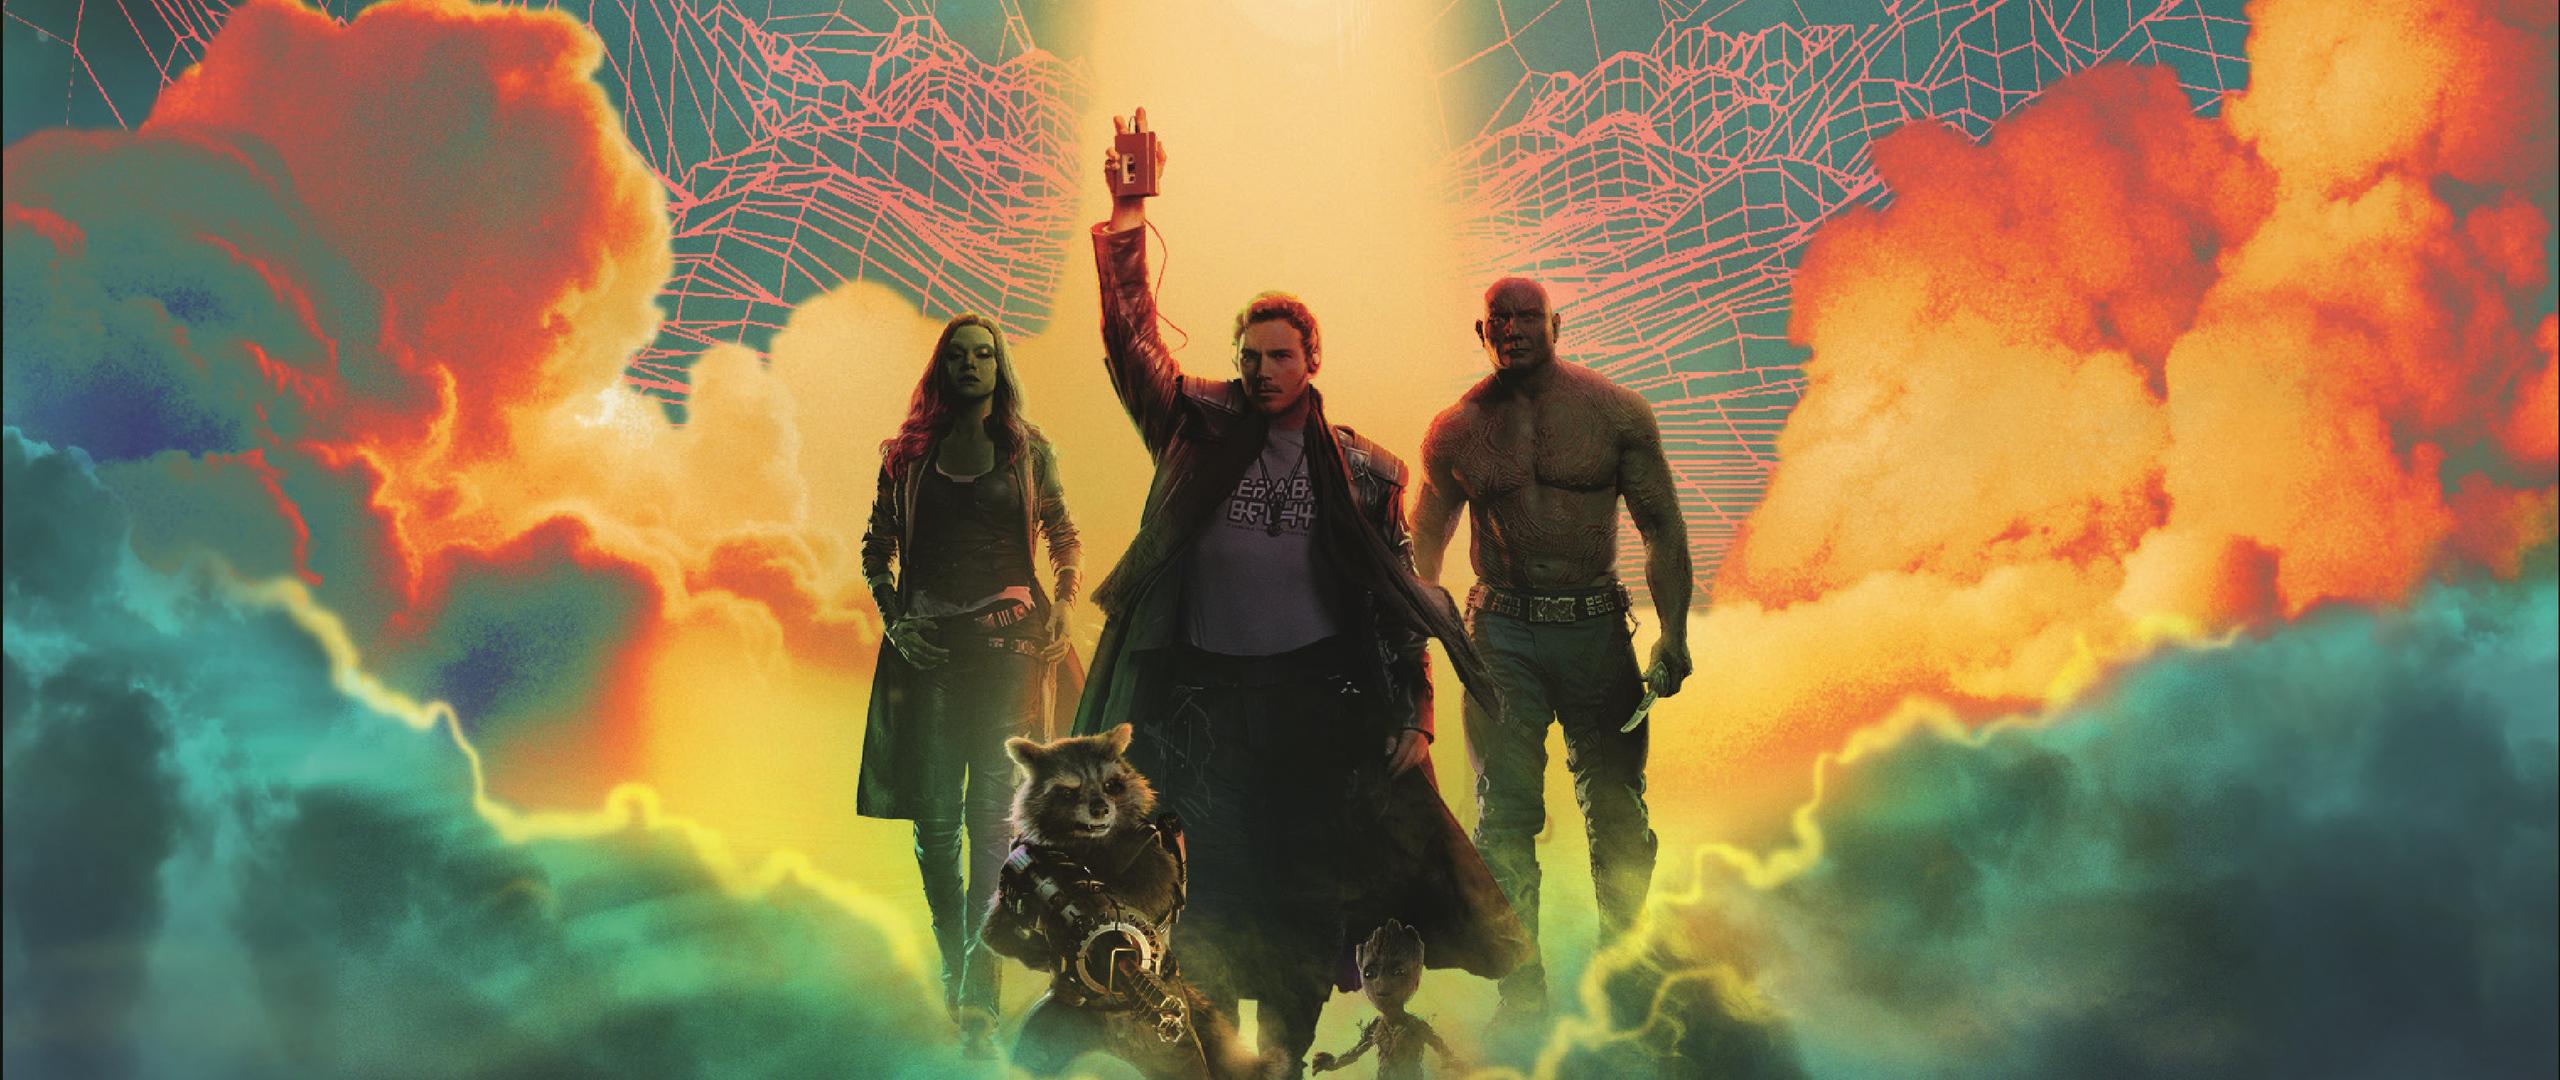 2560x1080 Guardians Of The Galaxy 4k Art 2560x1080 Resolution Hd